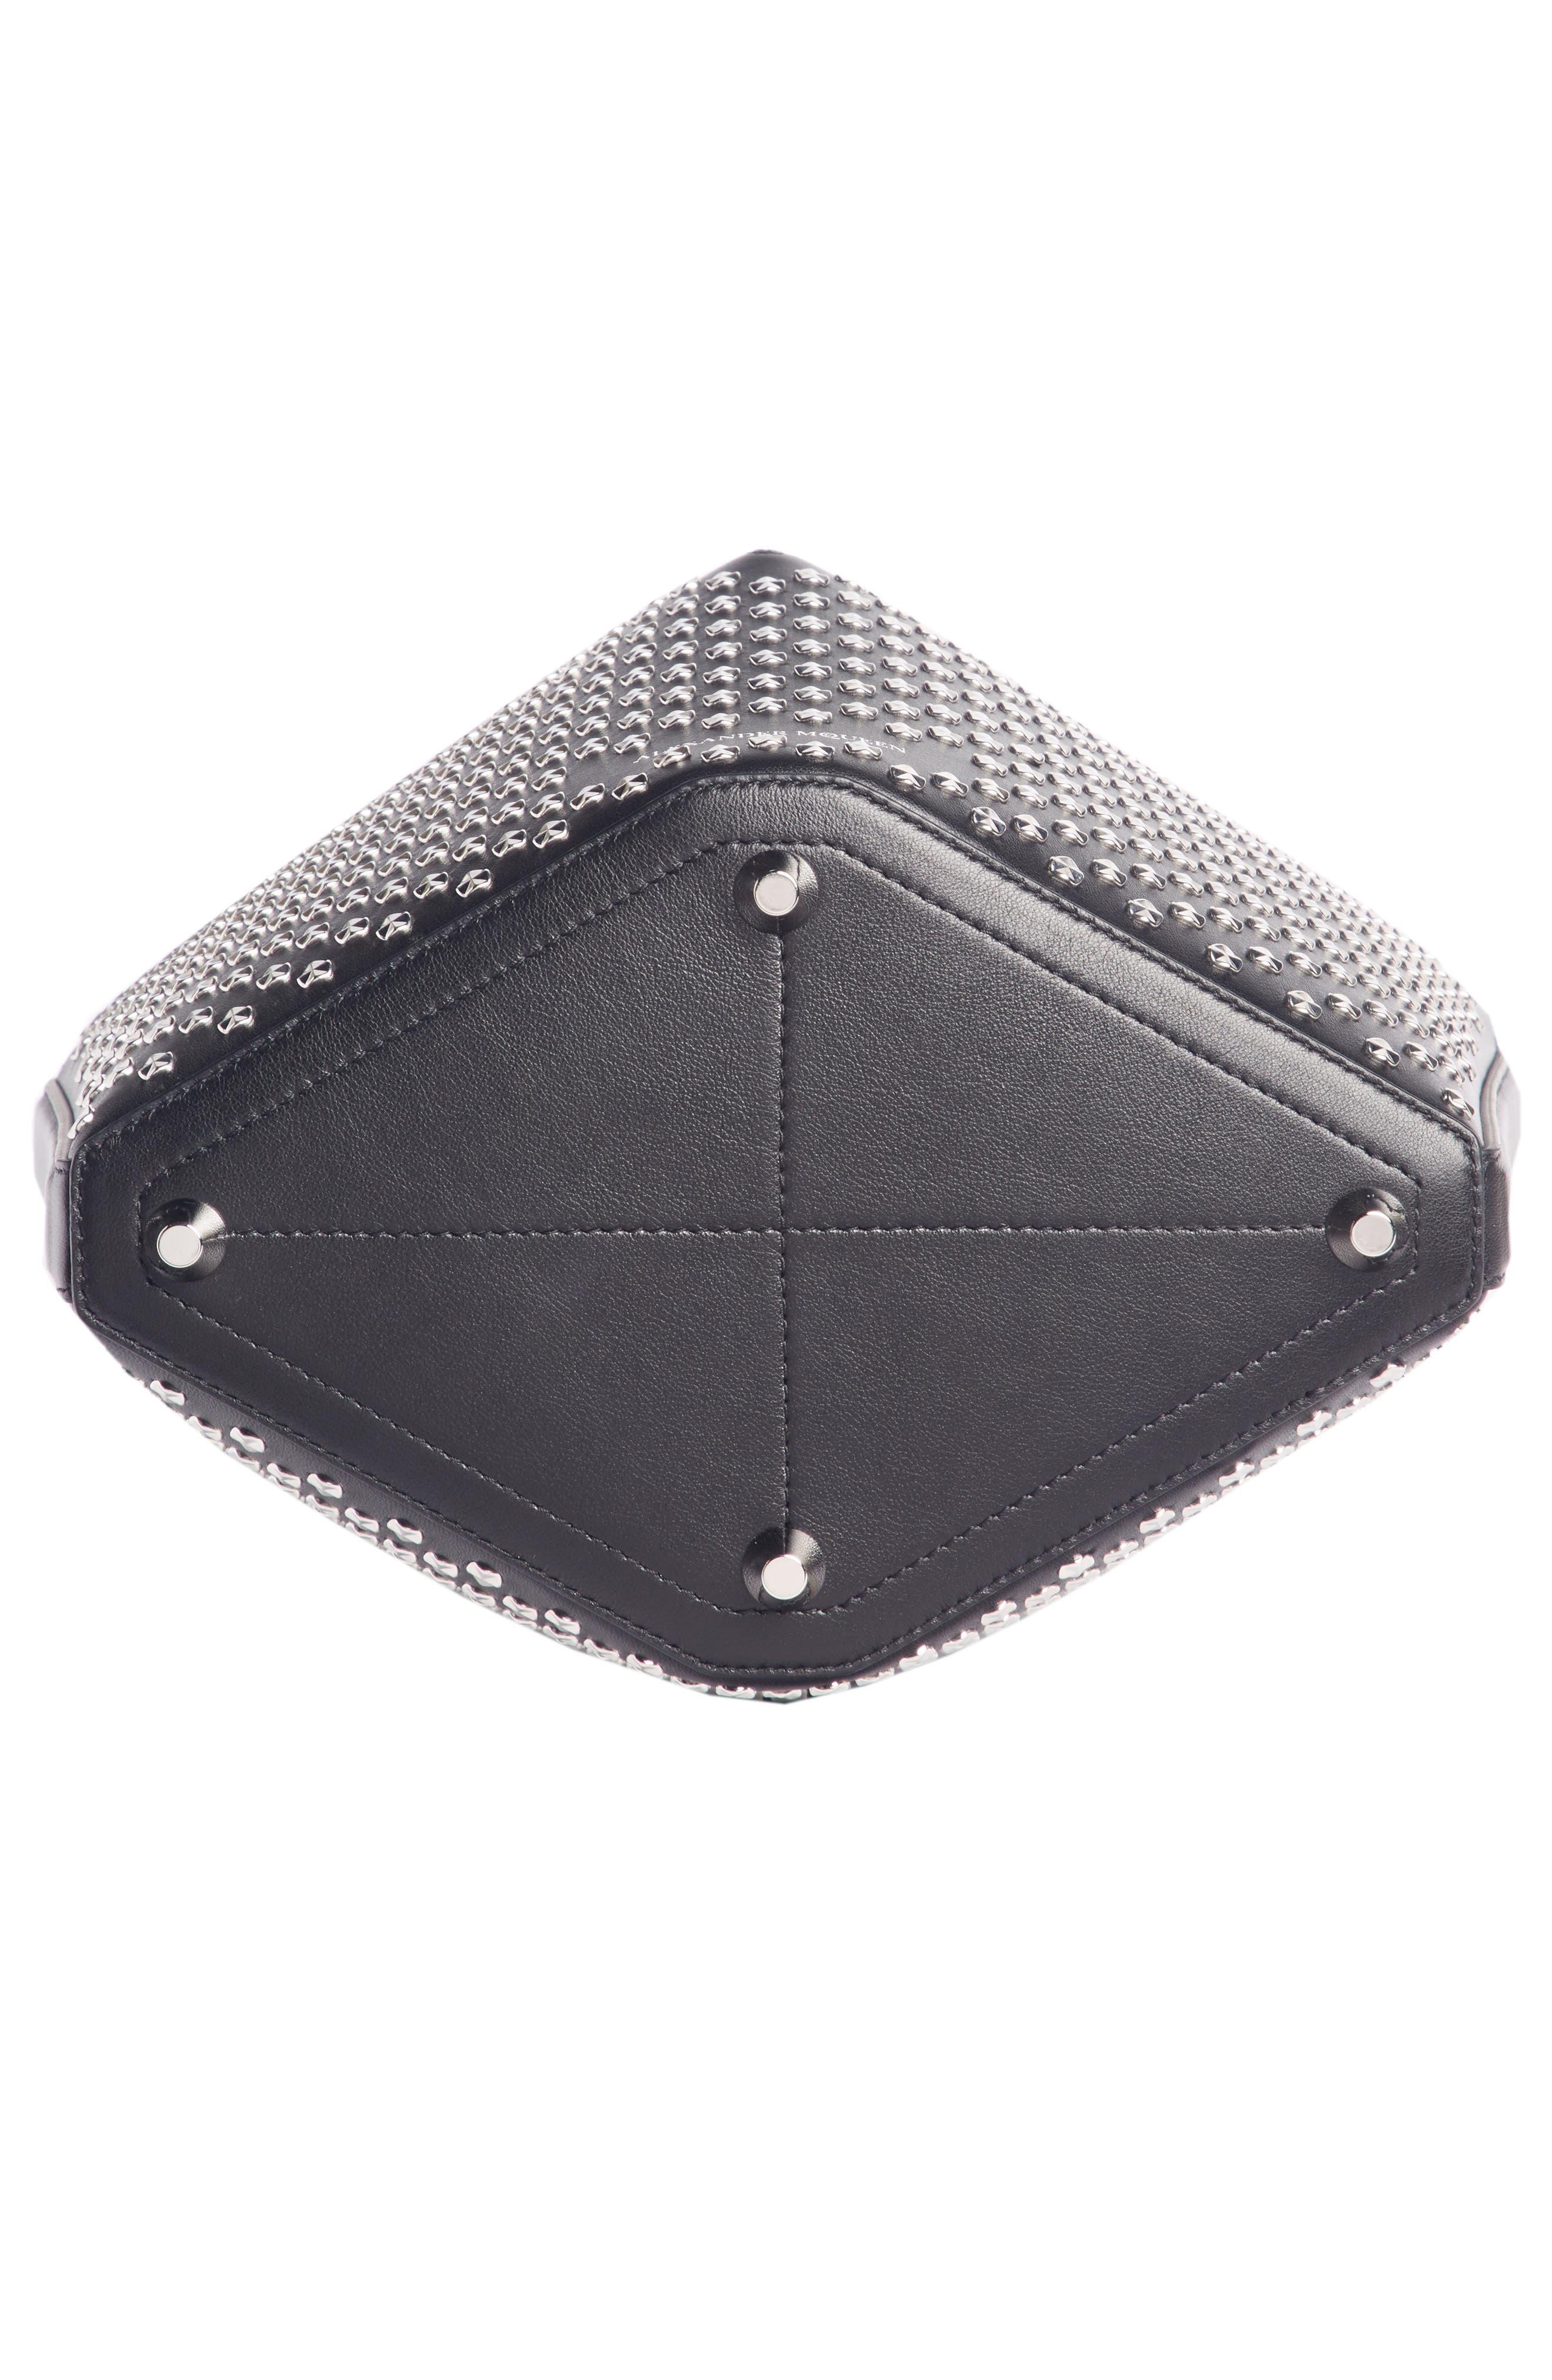 Studded Leather Bucket Bag,                             Alternate thumbnail 5, color,                             BLACK